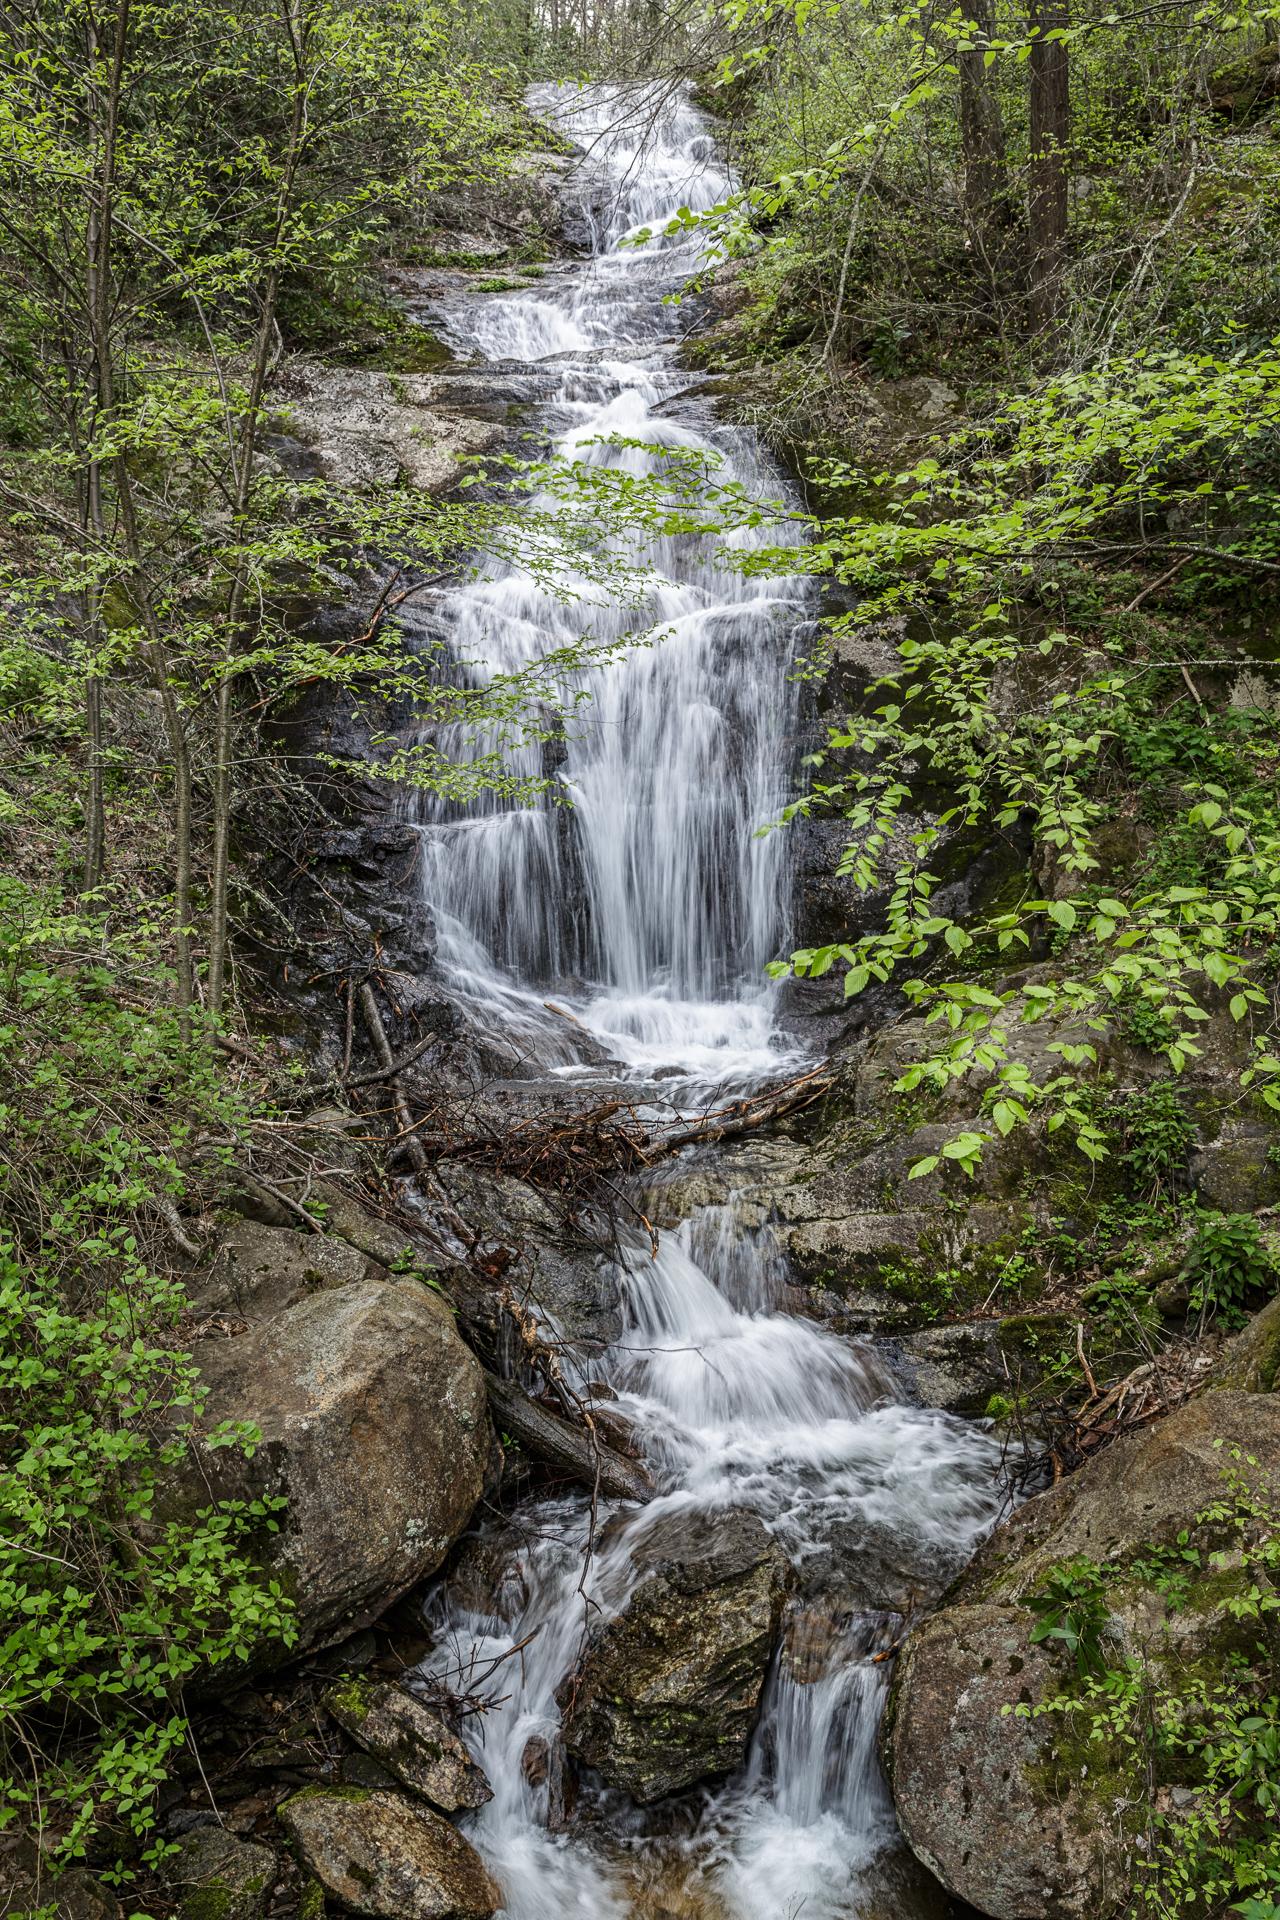 walker-falls-in-the-pisgah-national-forest-Kathleen-Kathy-Roberts-Asheville-NC-Photographer-4.jpg